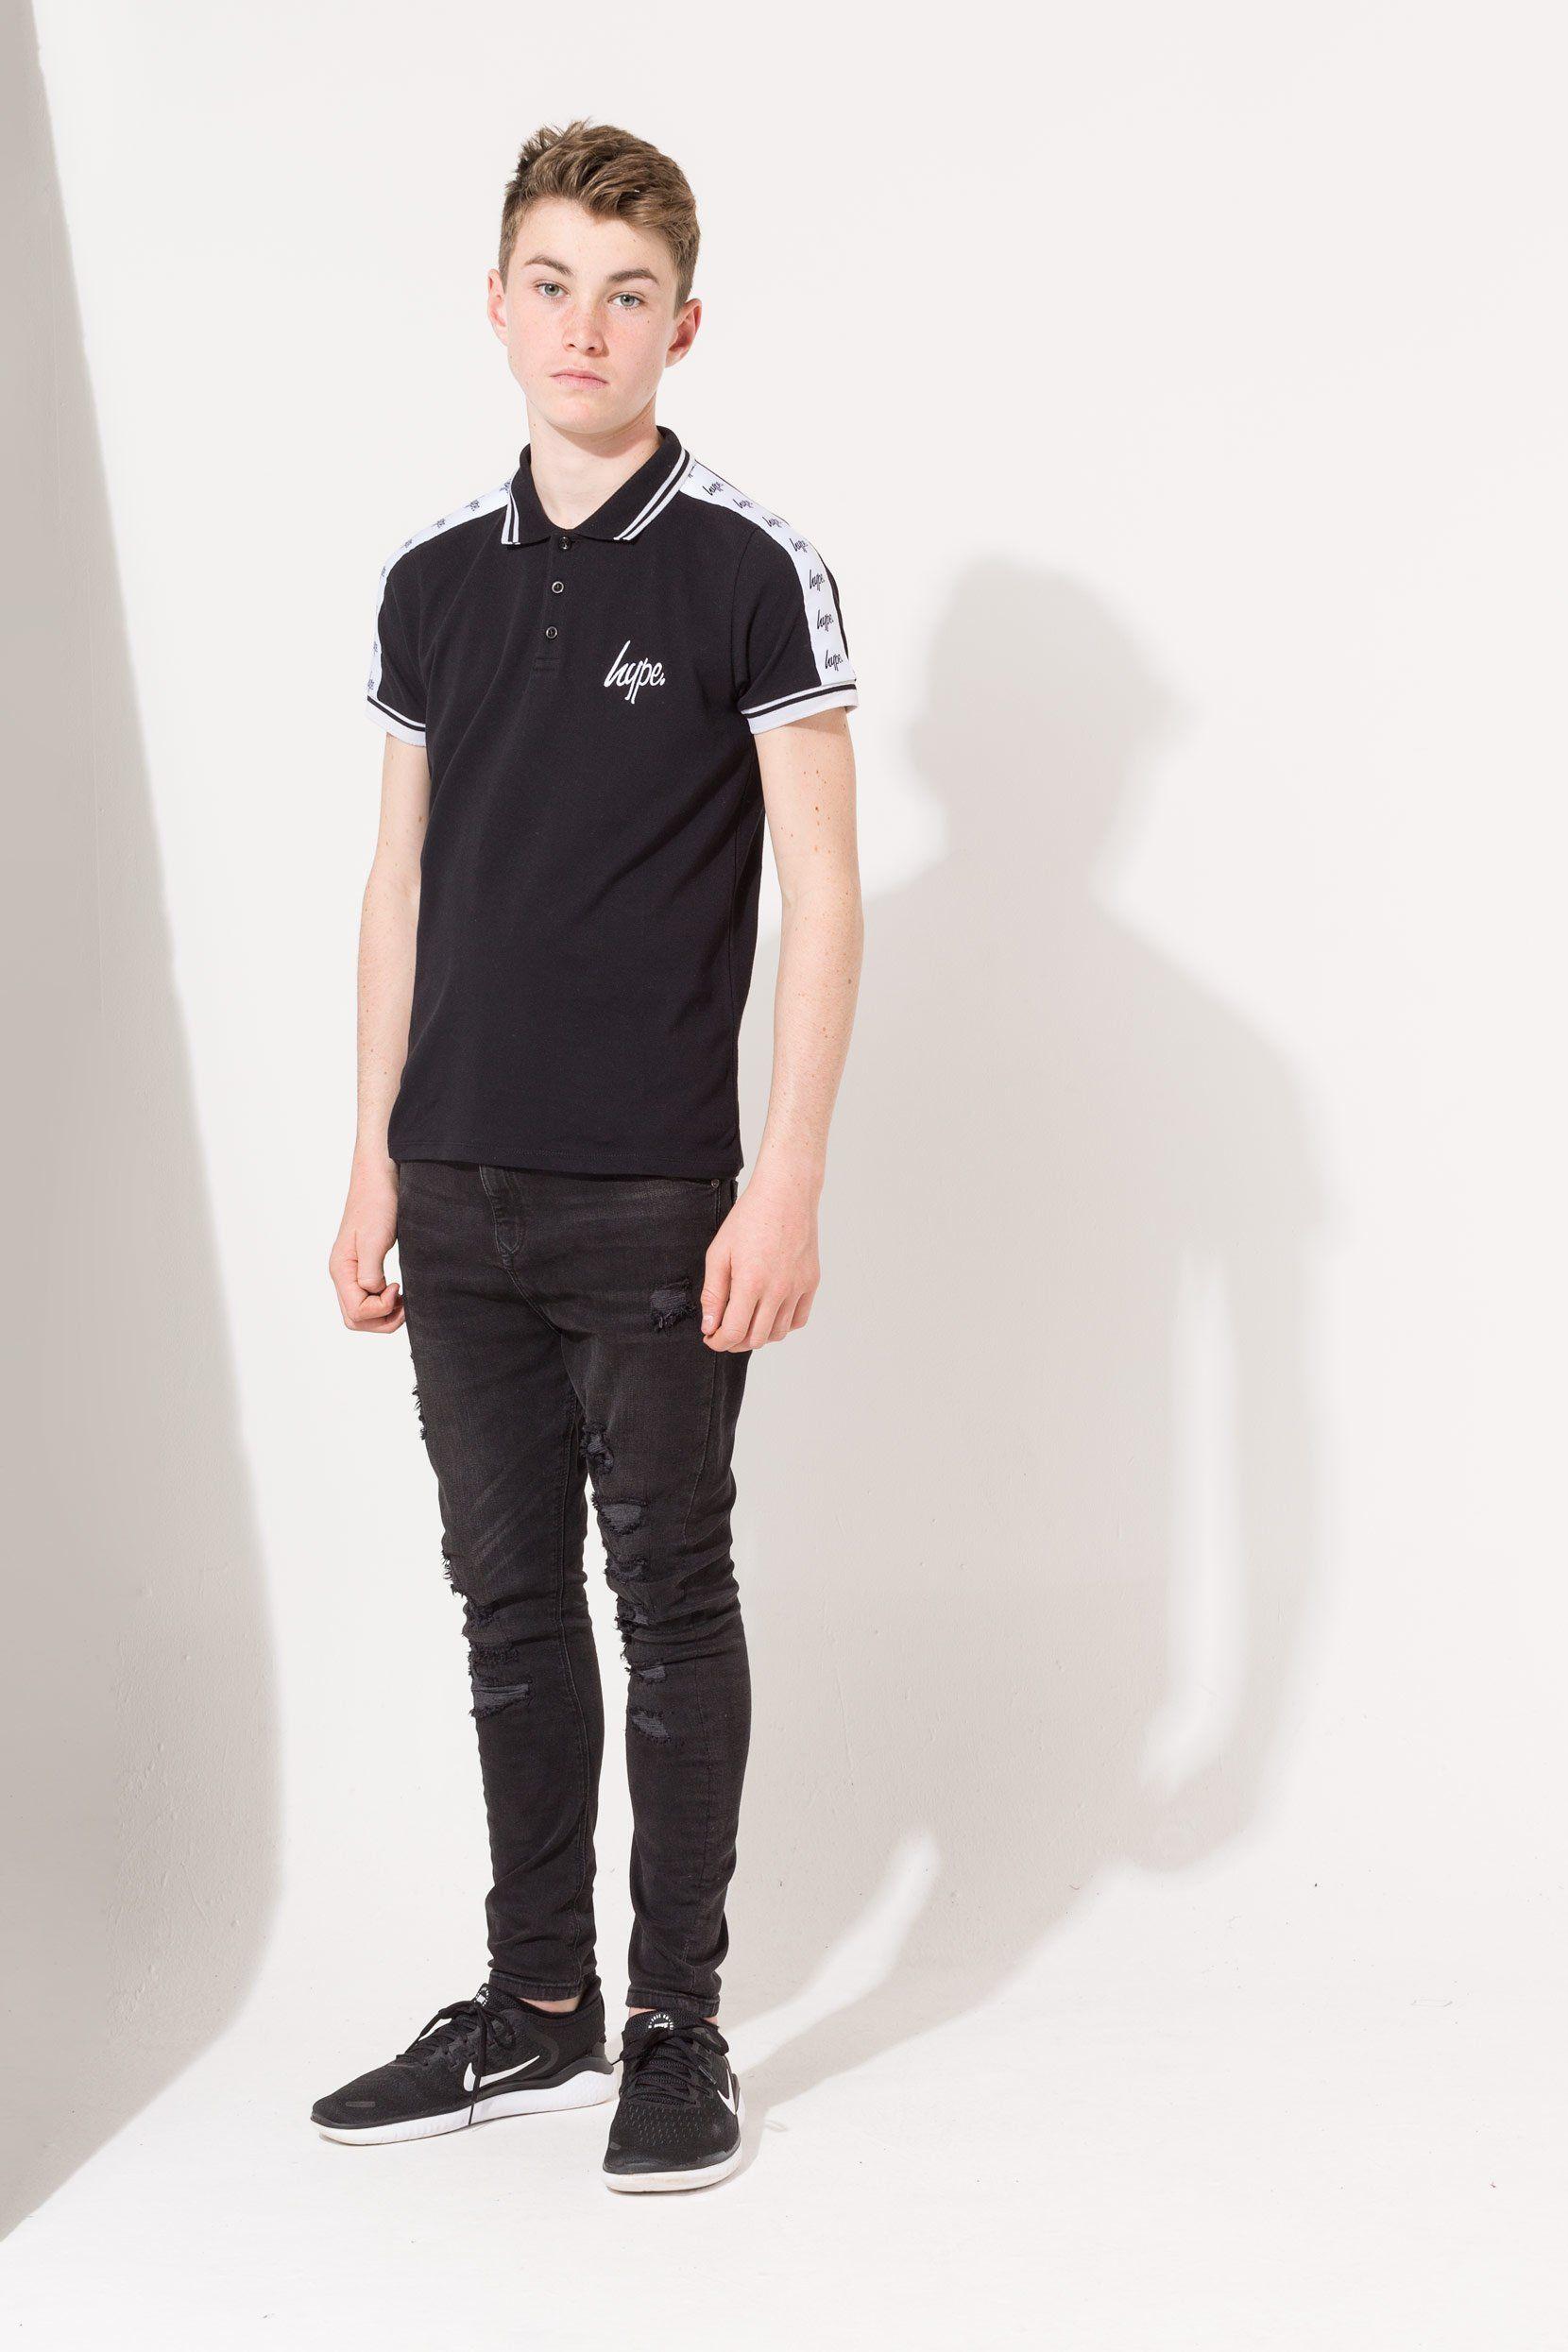 Hype Black Tape Script Kids Polo Shirt